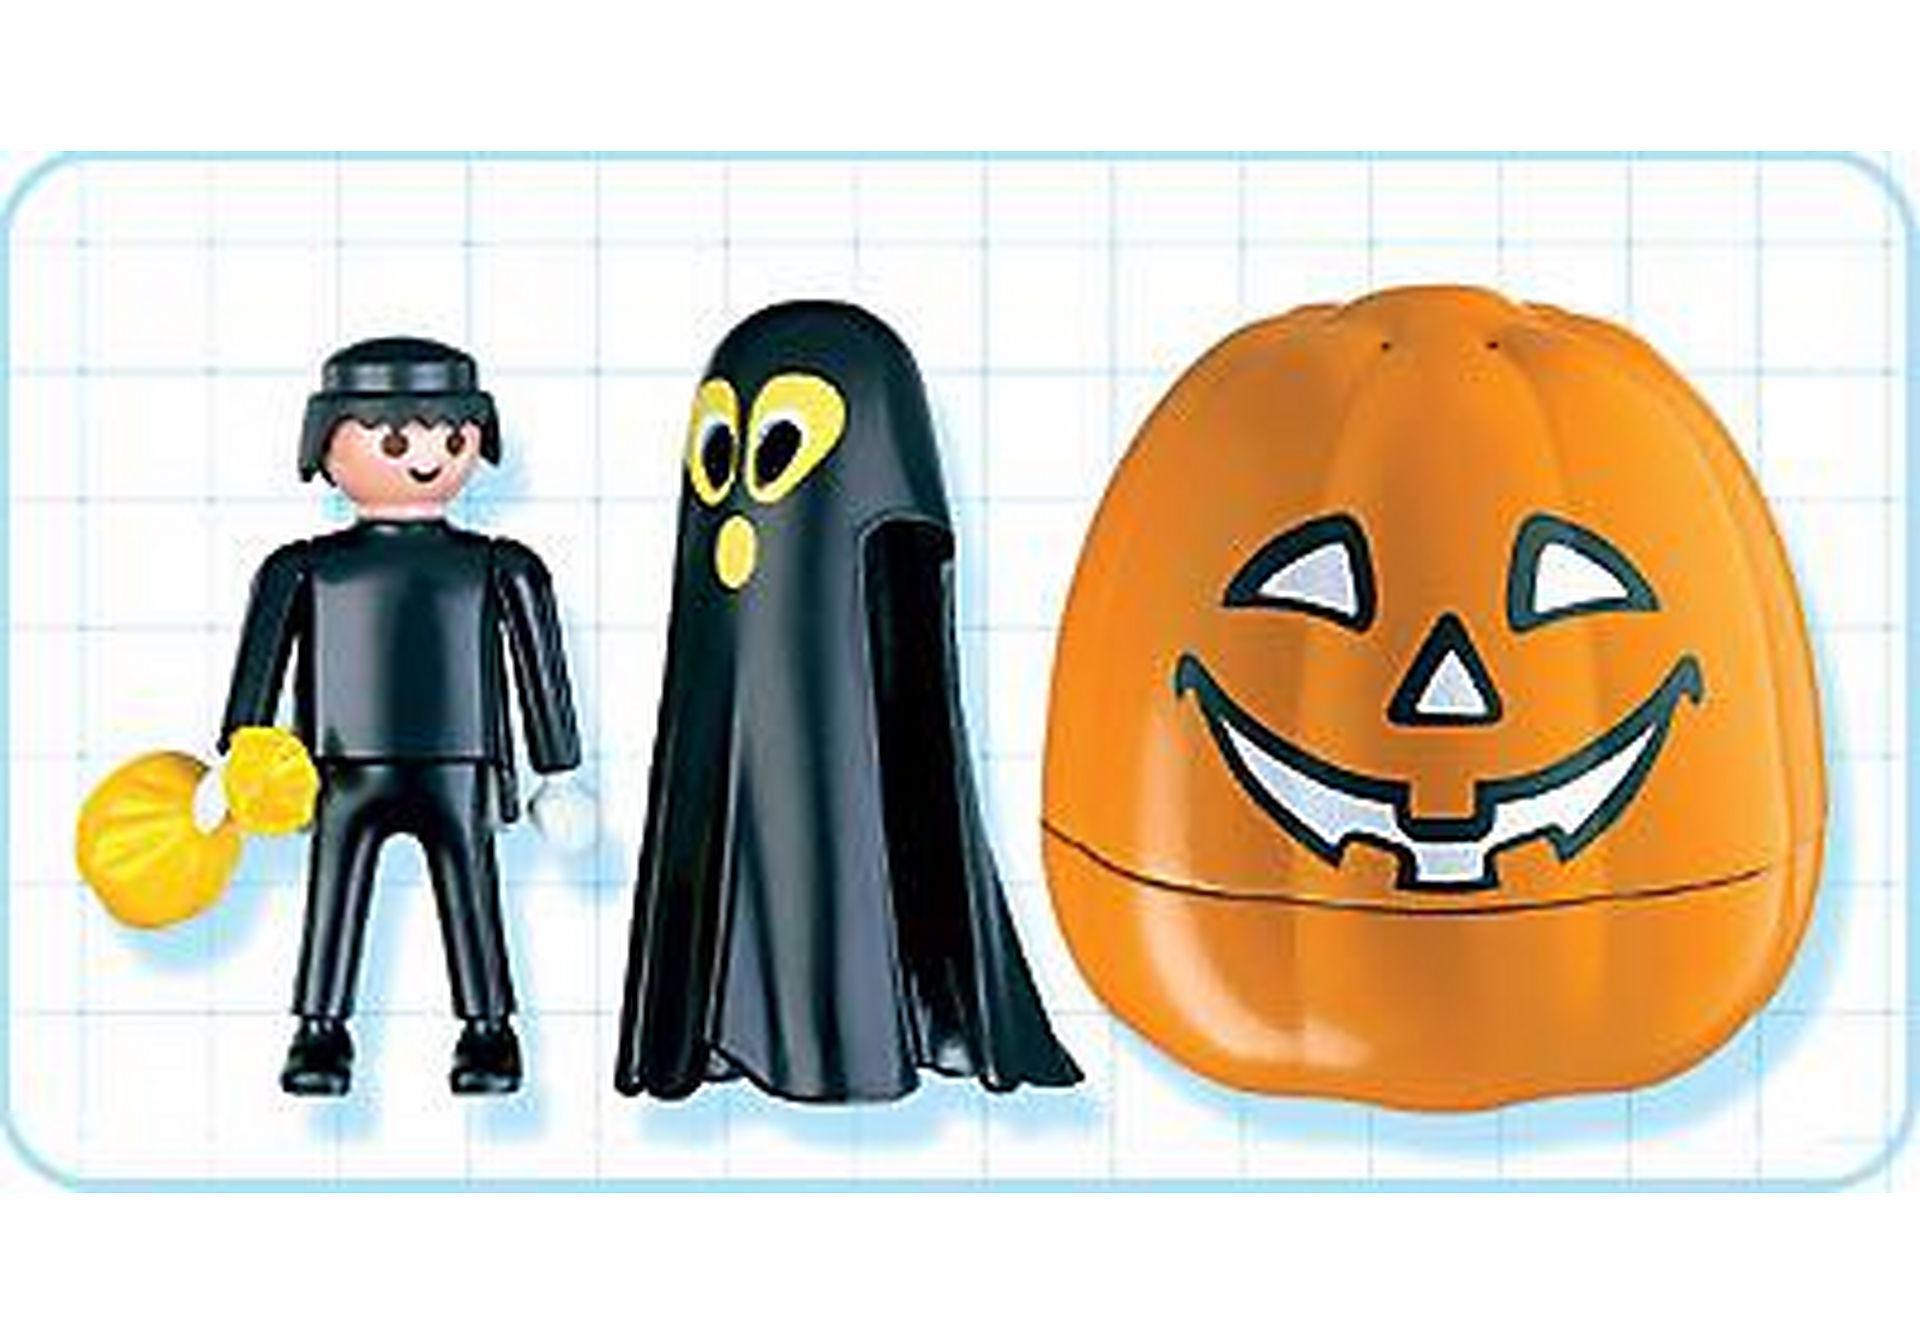 4771-A HalloweenSet - Gespenst zoom image2